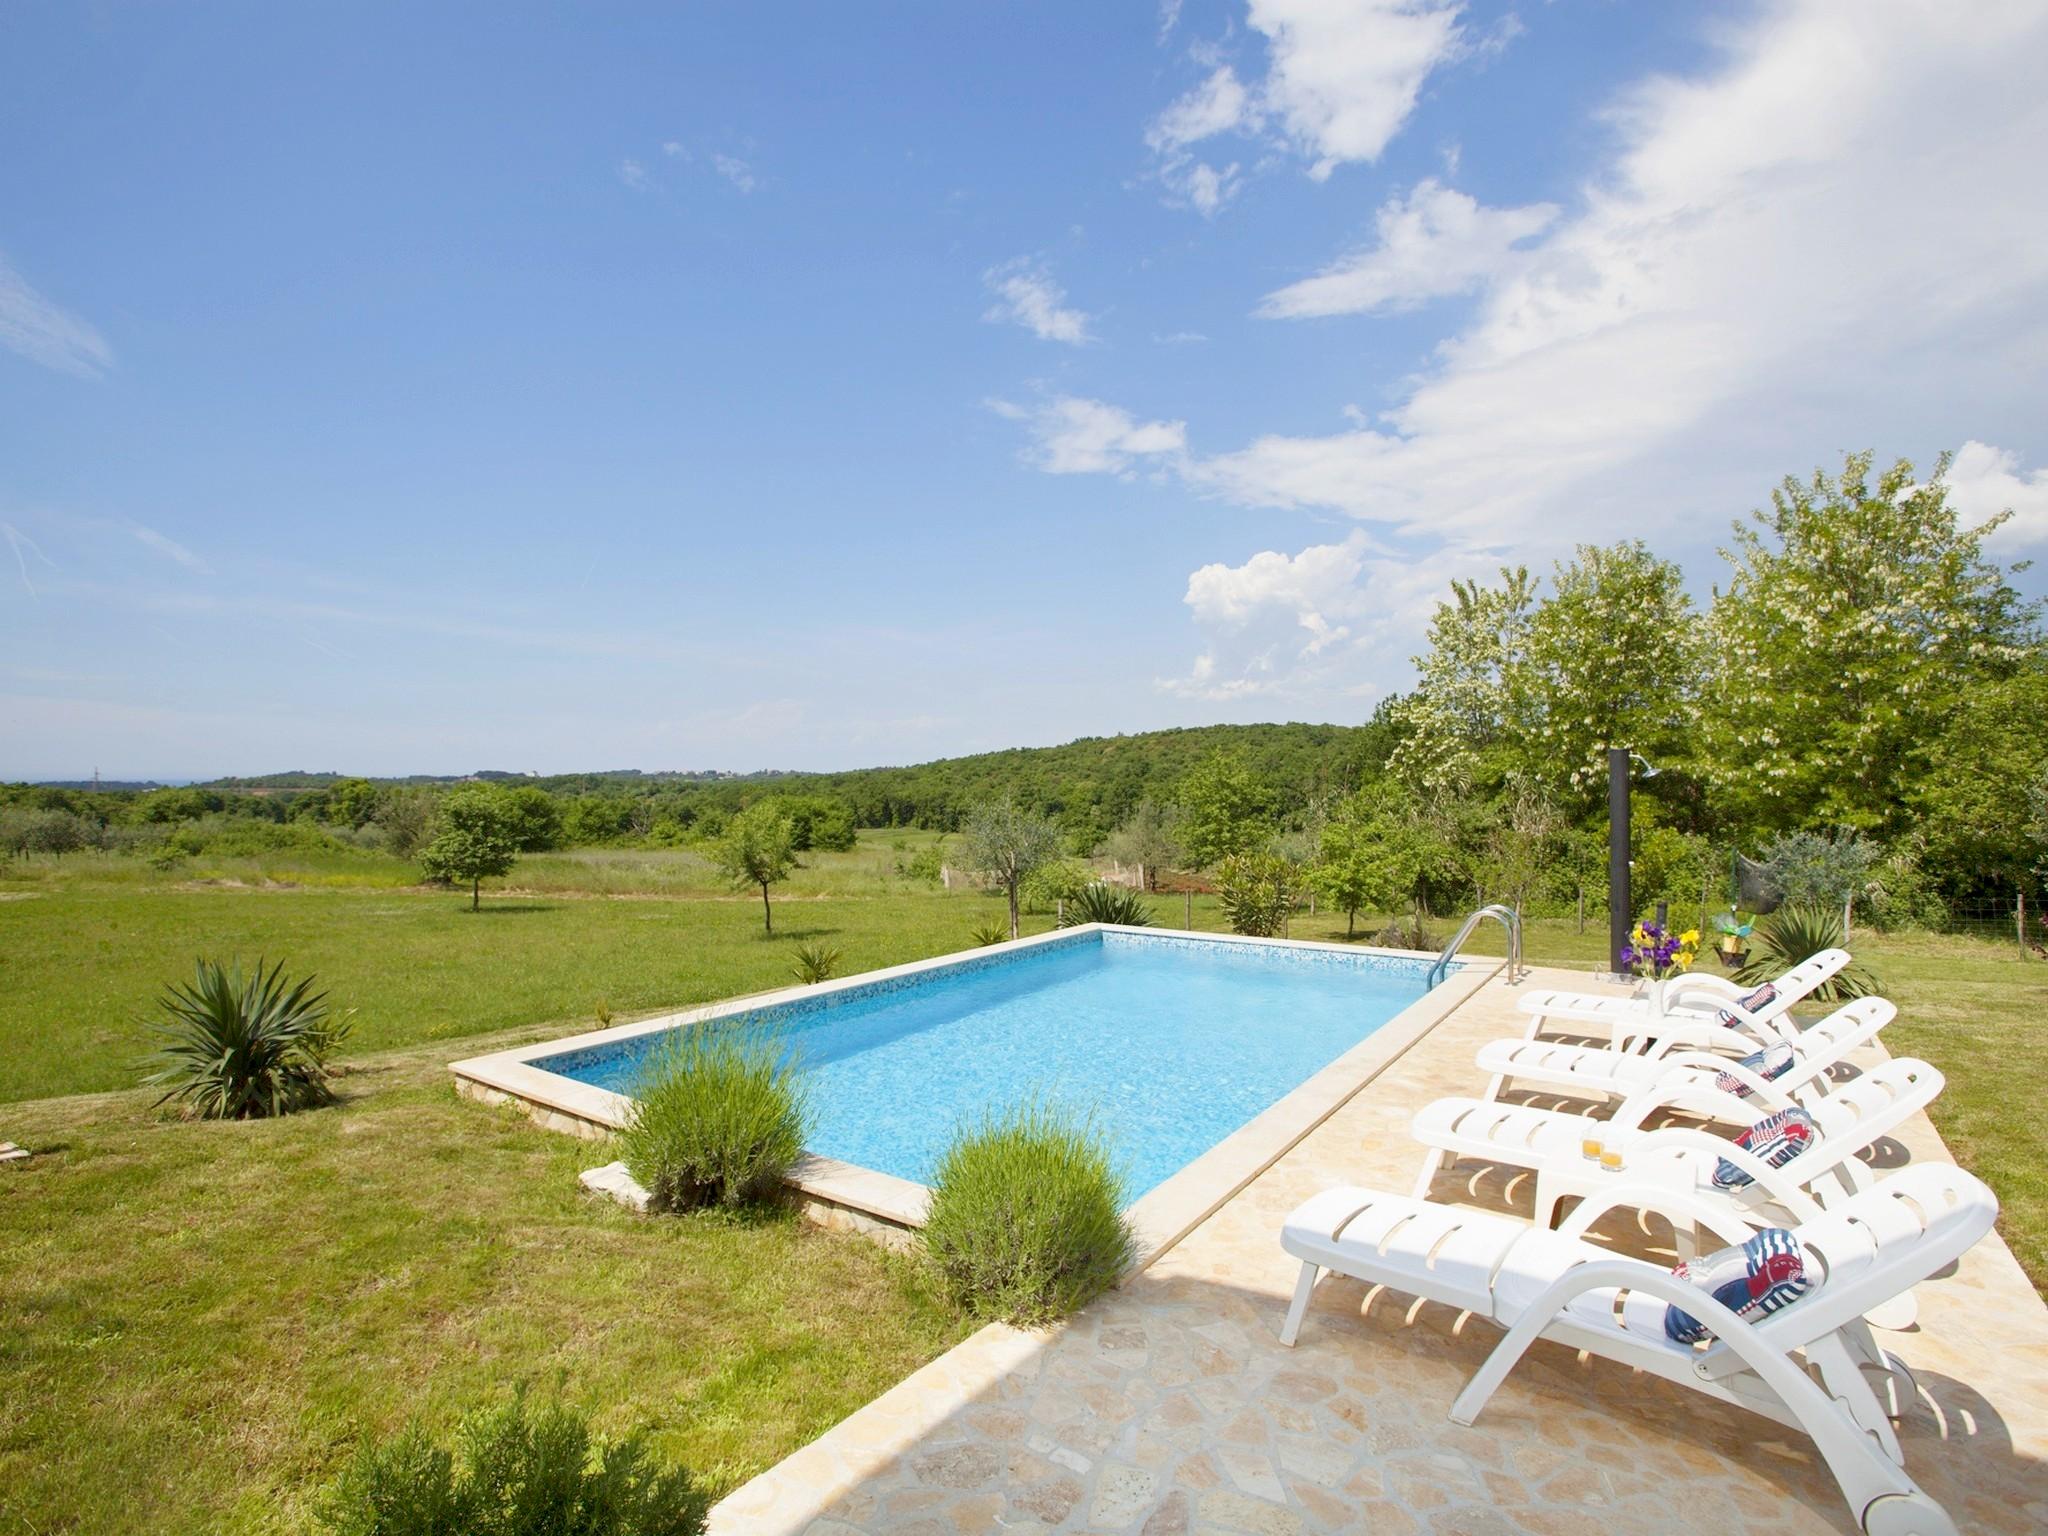 Ferienhaus Bruno, Kua za odmor s bazenom (2204668), Mugeba, , Istrien, Kroatien, Bild 3